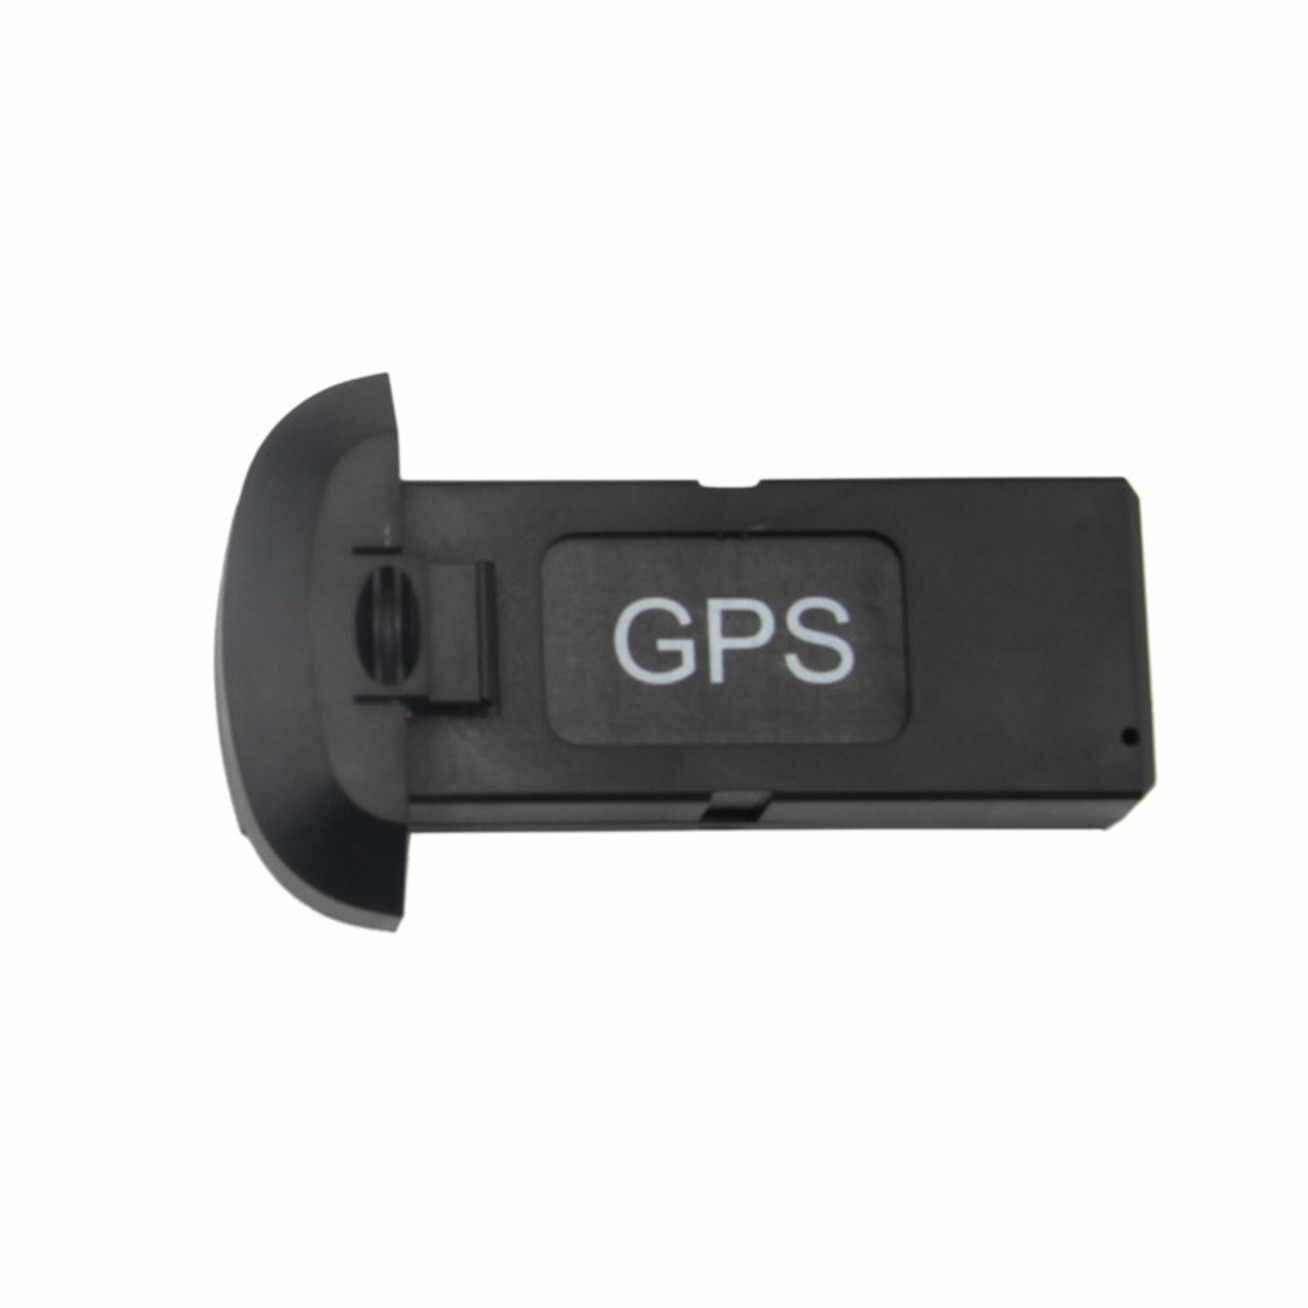 1 PC 7,4 V 850 mAh batería de Lipo con Cable de cargador USB para CDHS H1 RC Quadcopter de alta calidad Lipo batería Drone RC Drone Accessories6.21